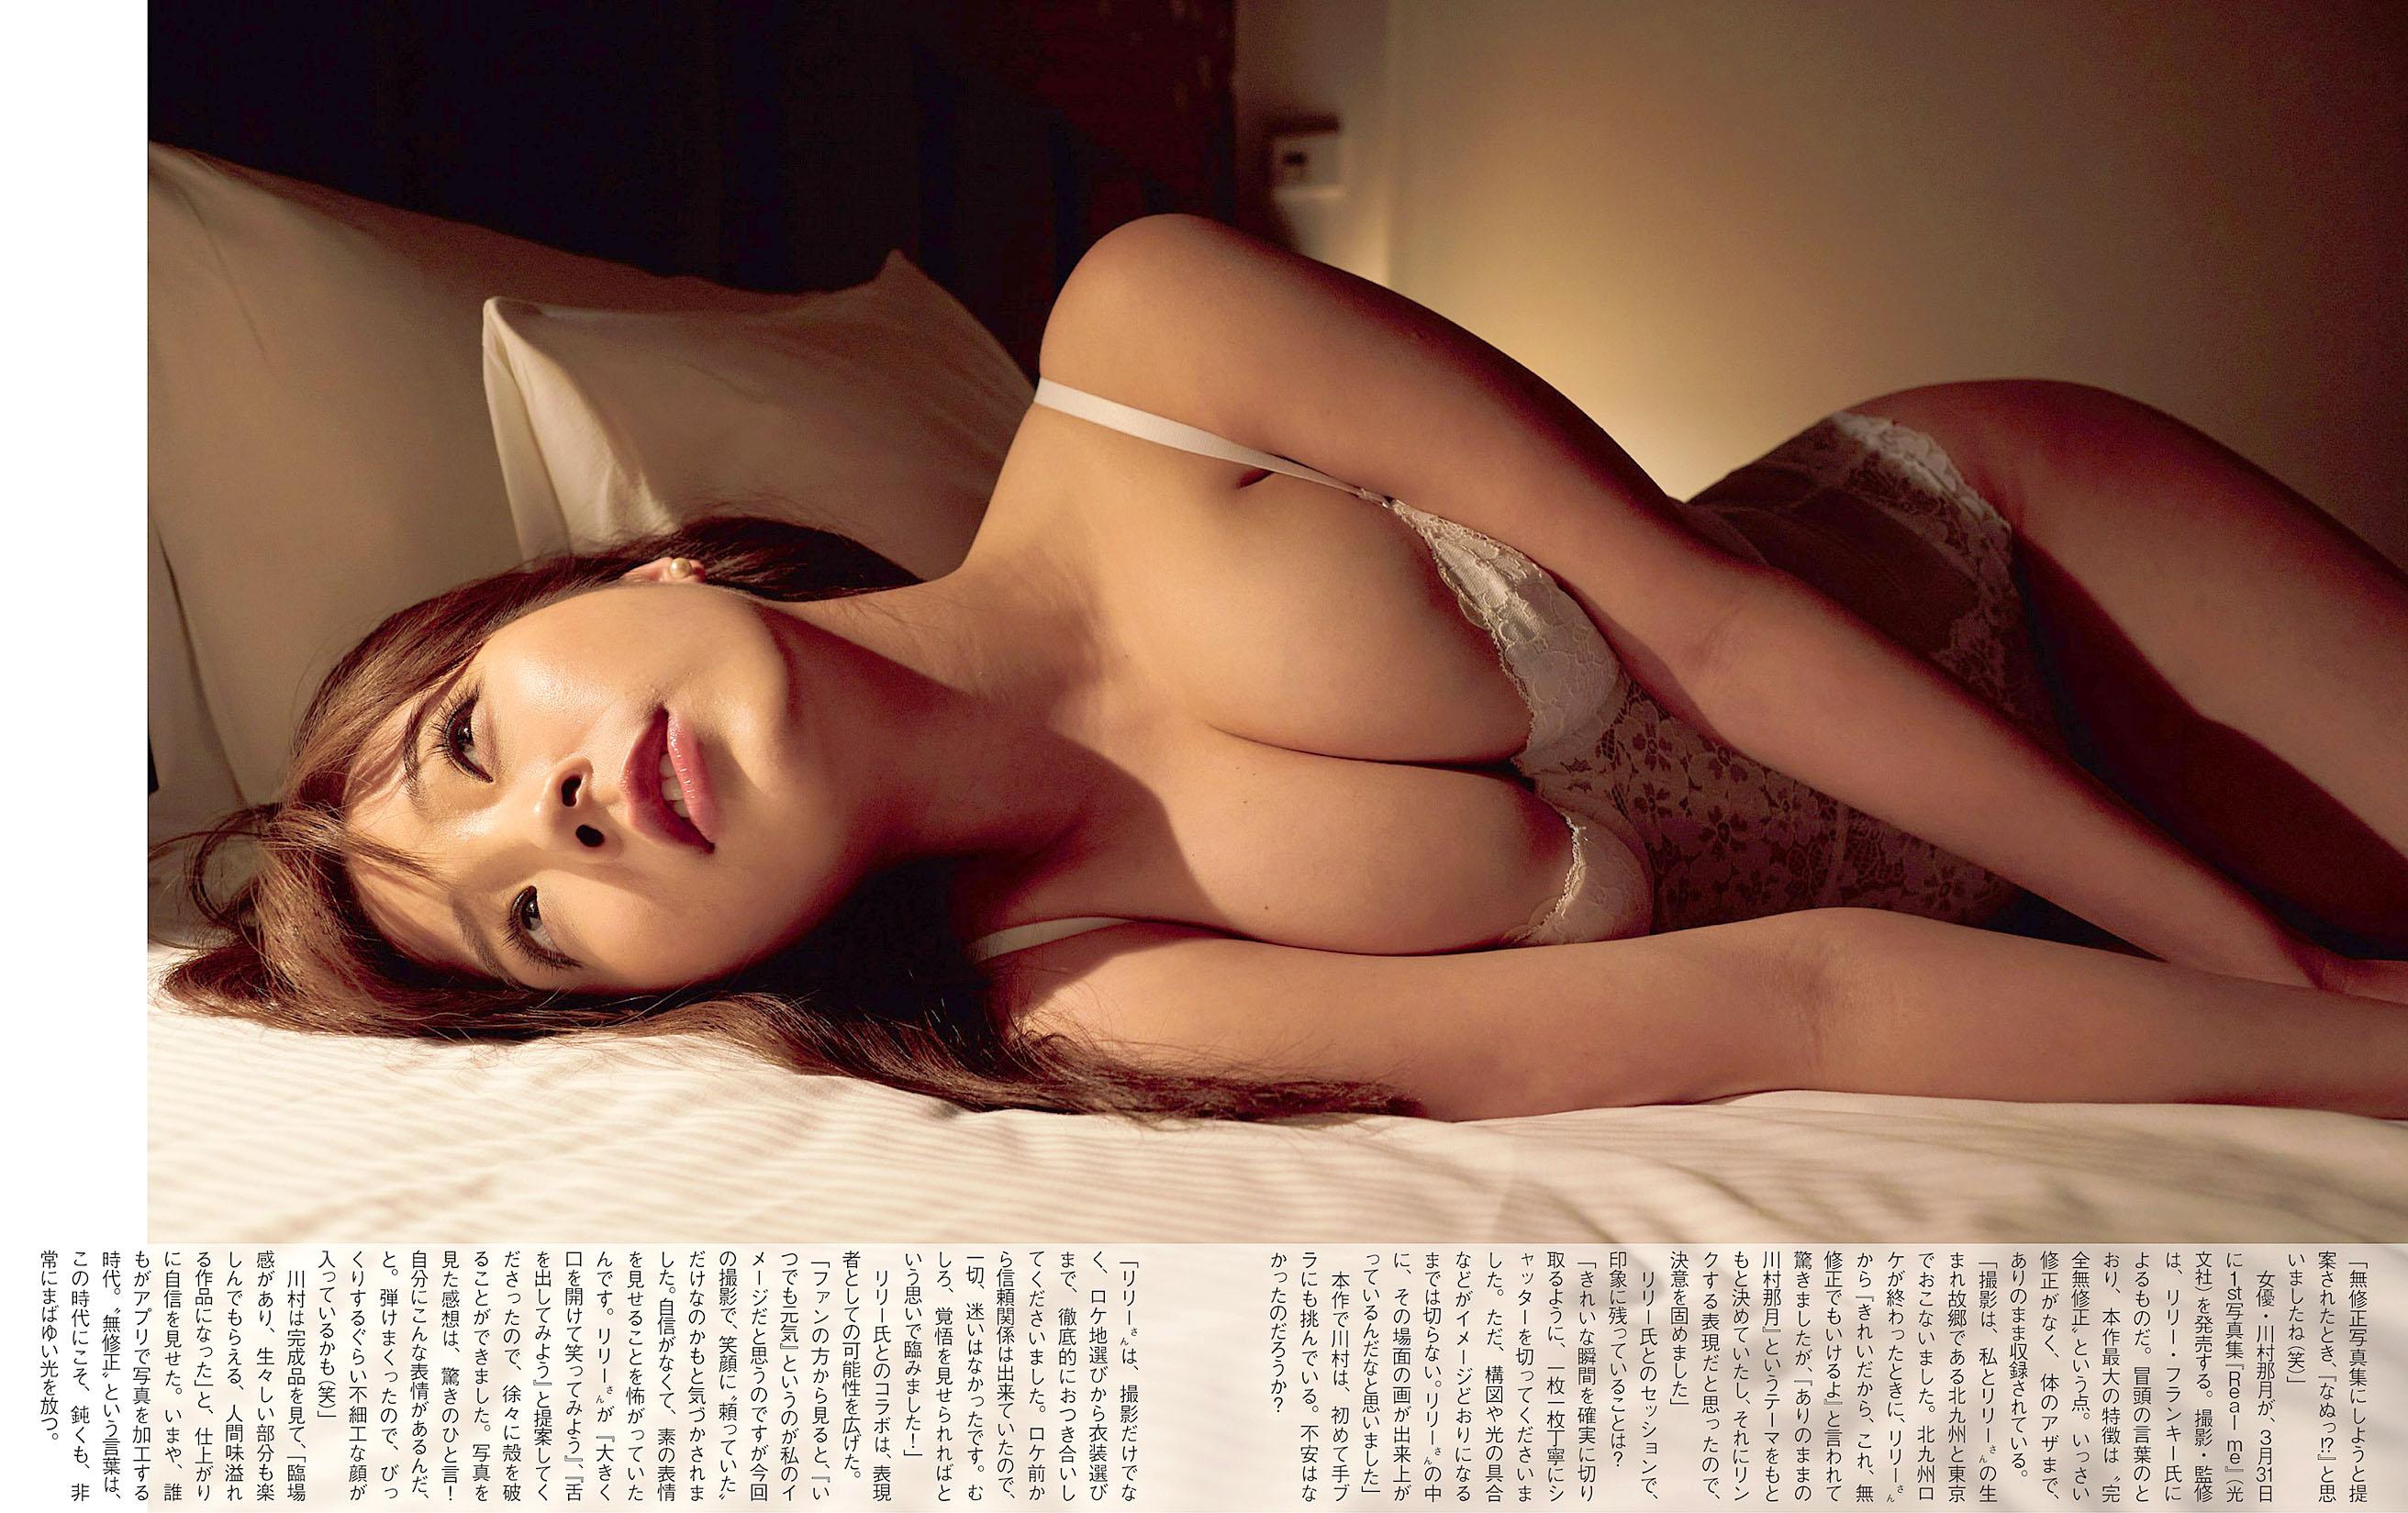 Natsuki Kawamura Flash 210302 07.jpg